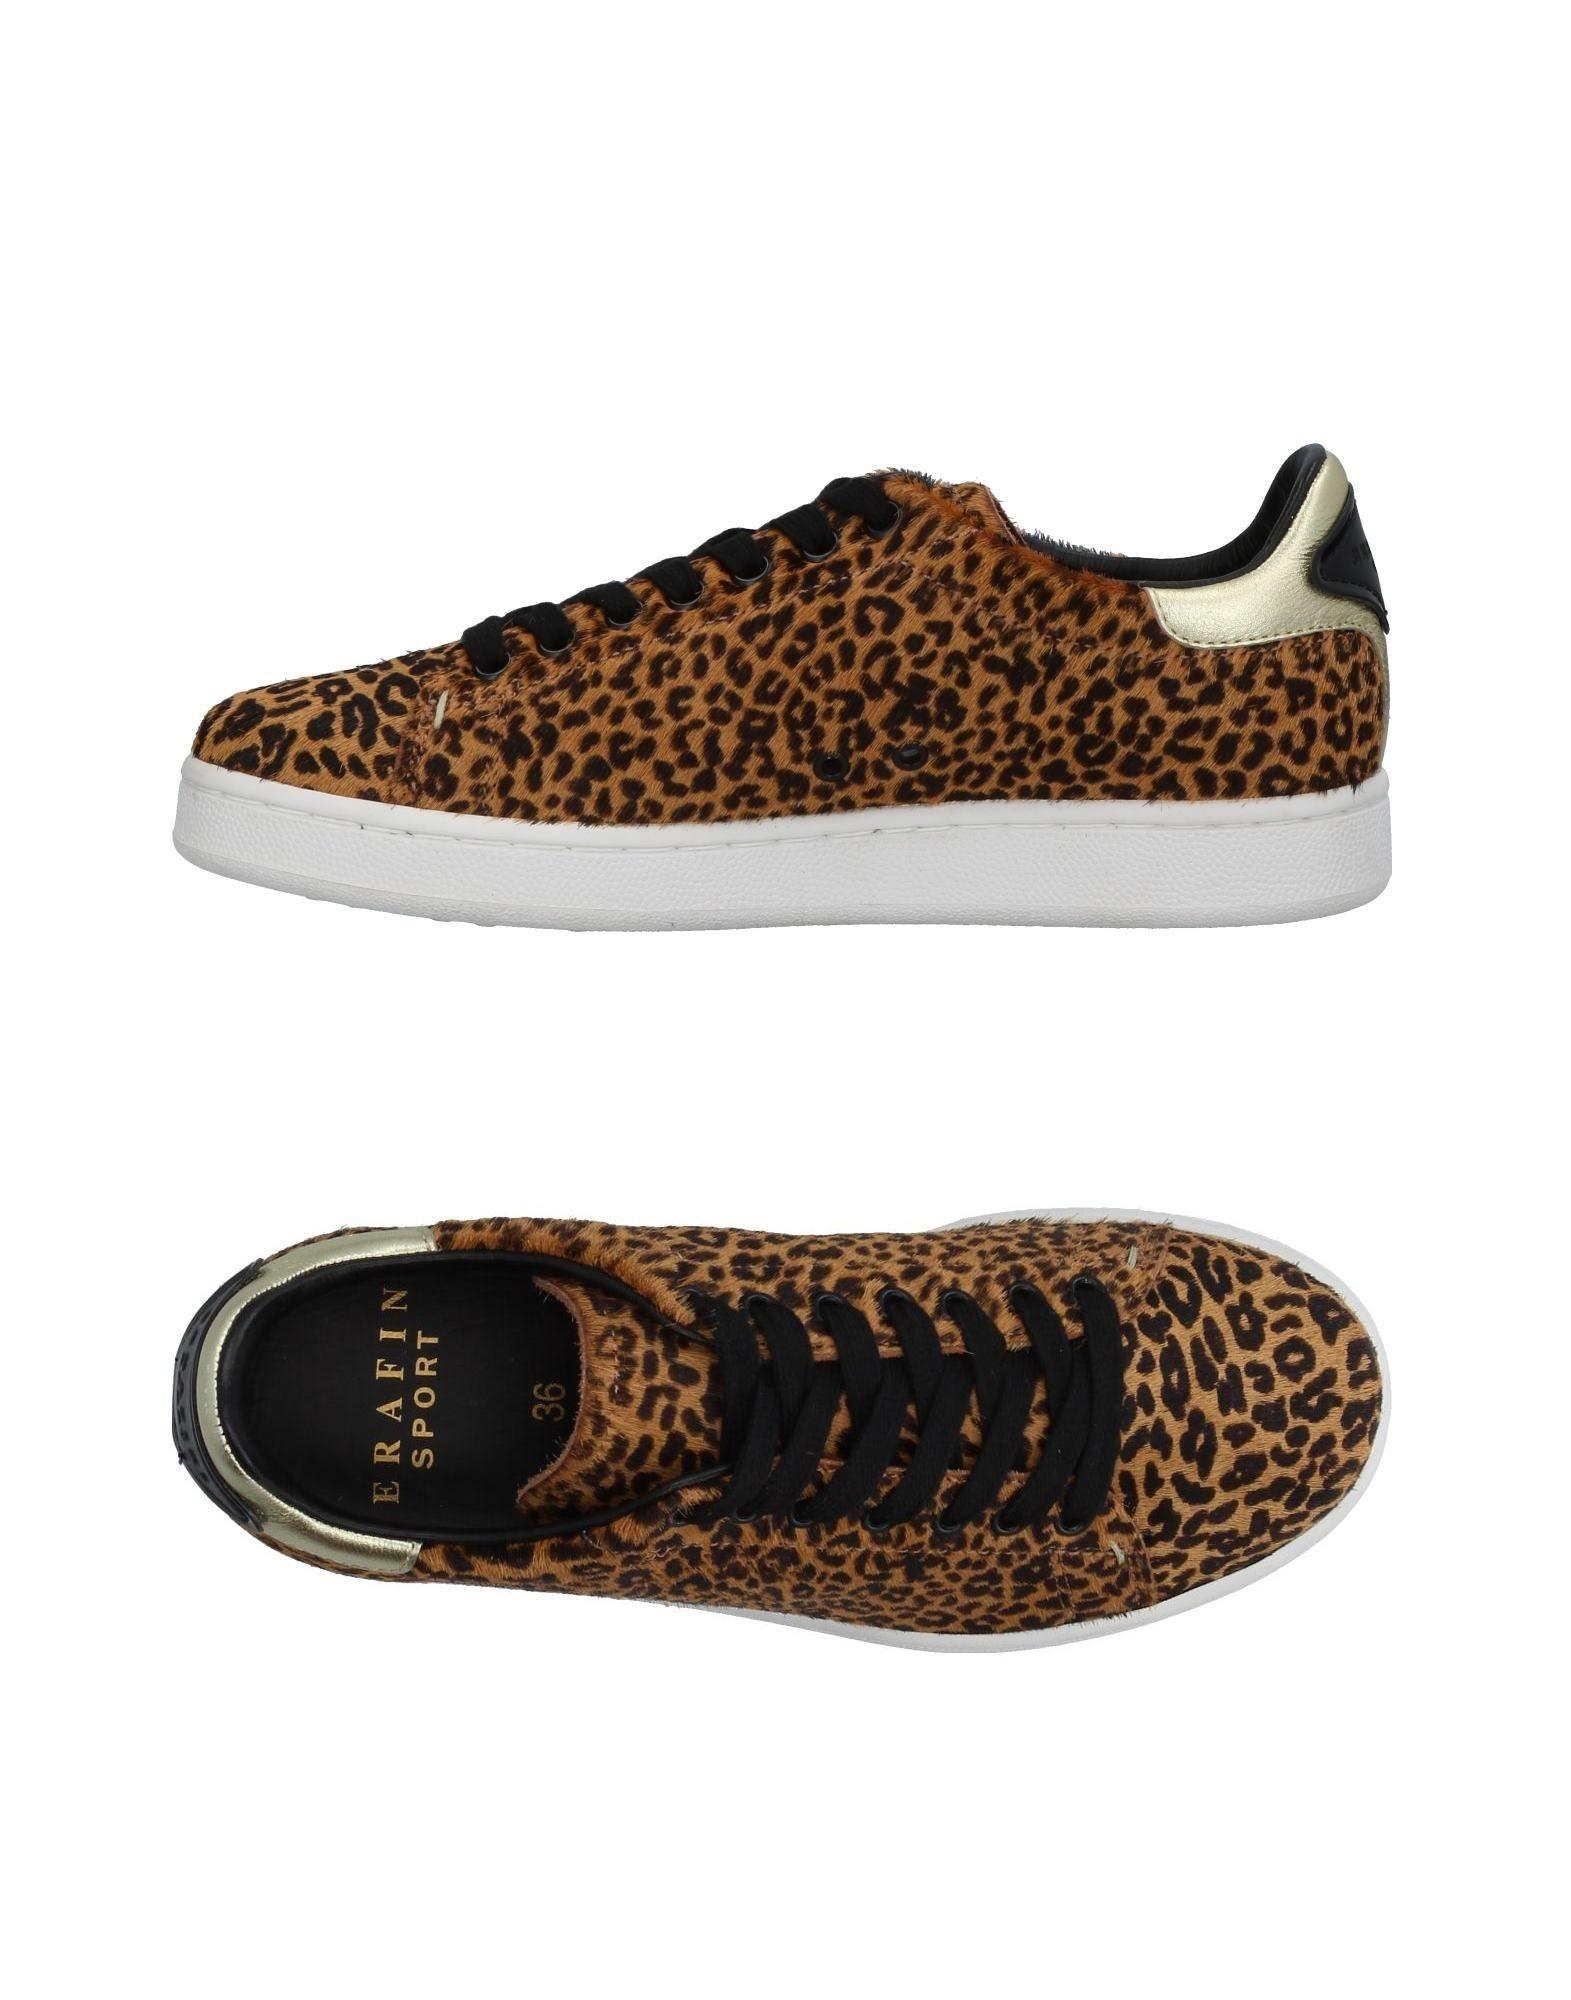 SERAFINI LUXURY Damen Low Sneakers & Tennisschuhe Farbe Braun Größe 5 jetztbilligerkaufen